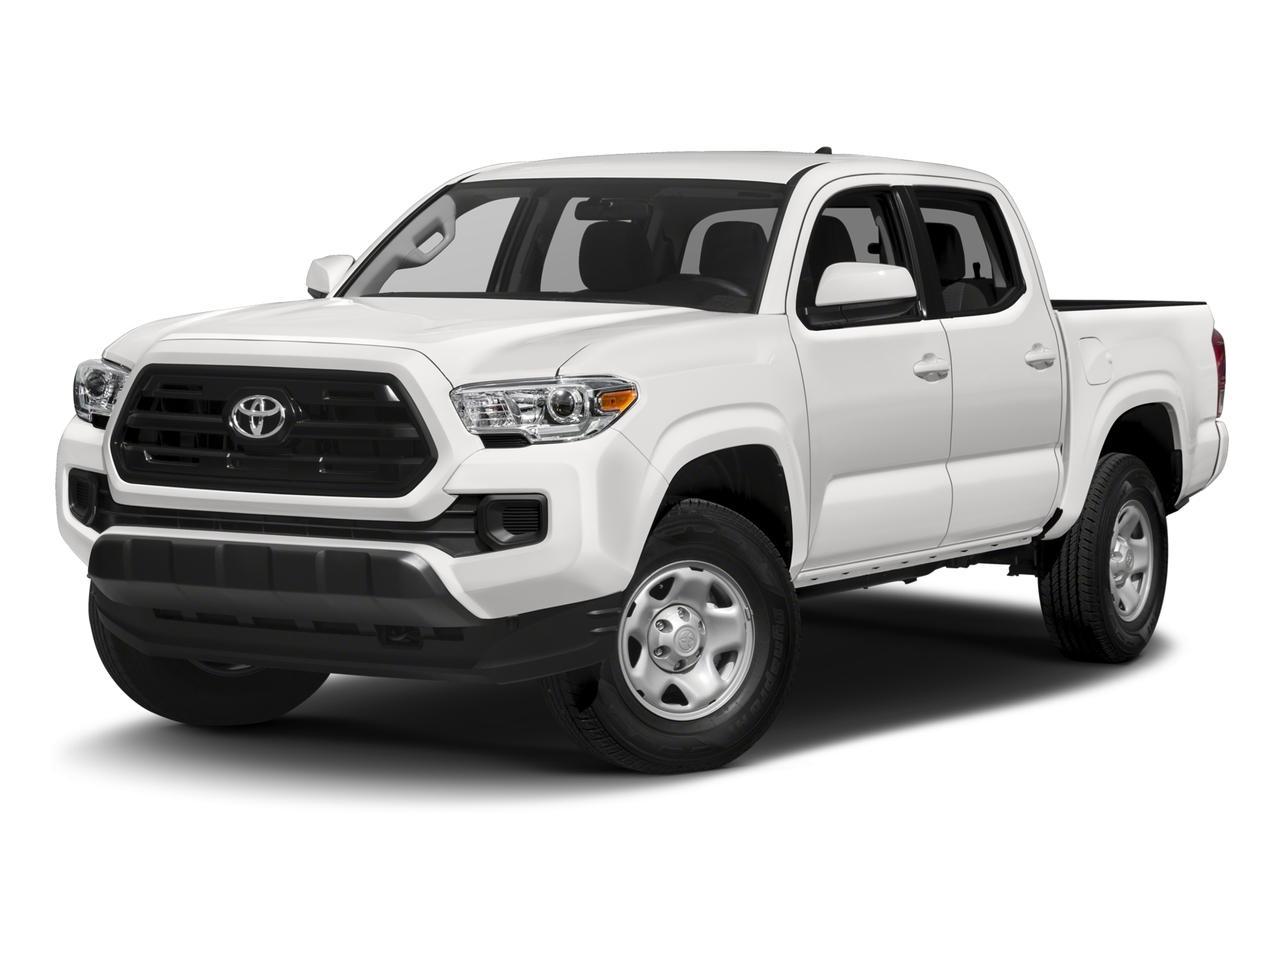 2016 Toyota Tacoma Vehicle Photo in San Antonio, TX 78254